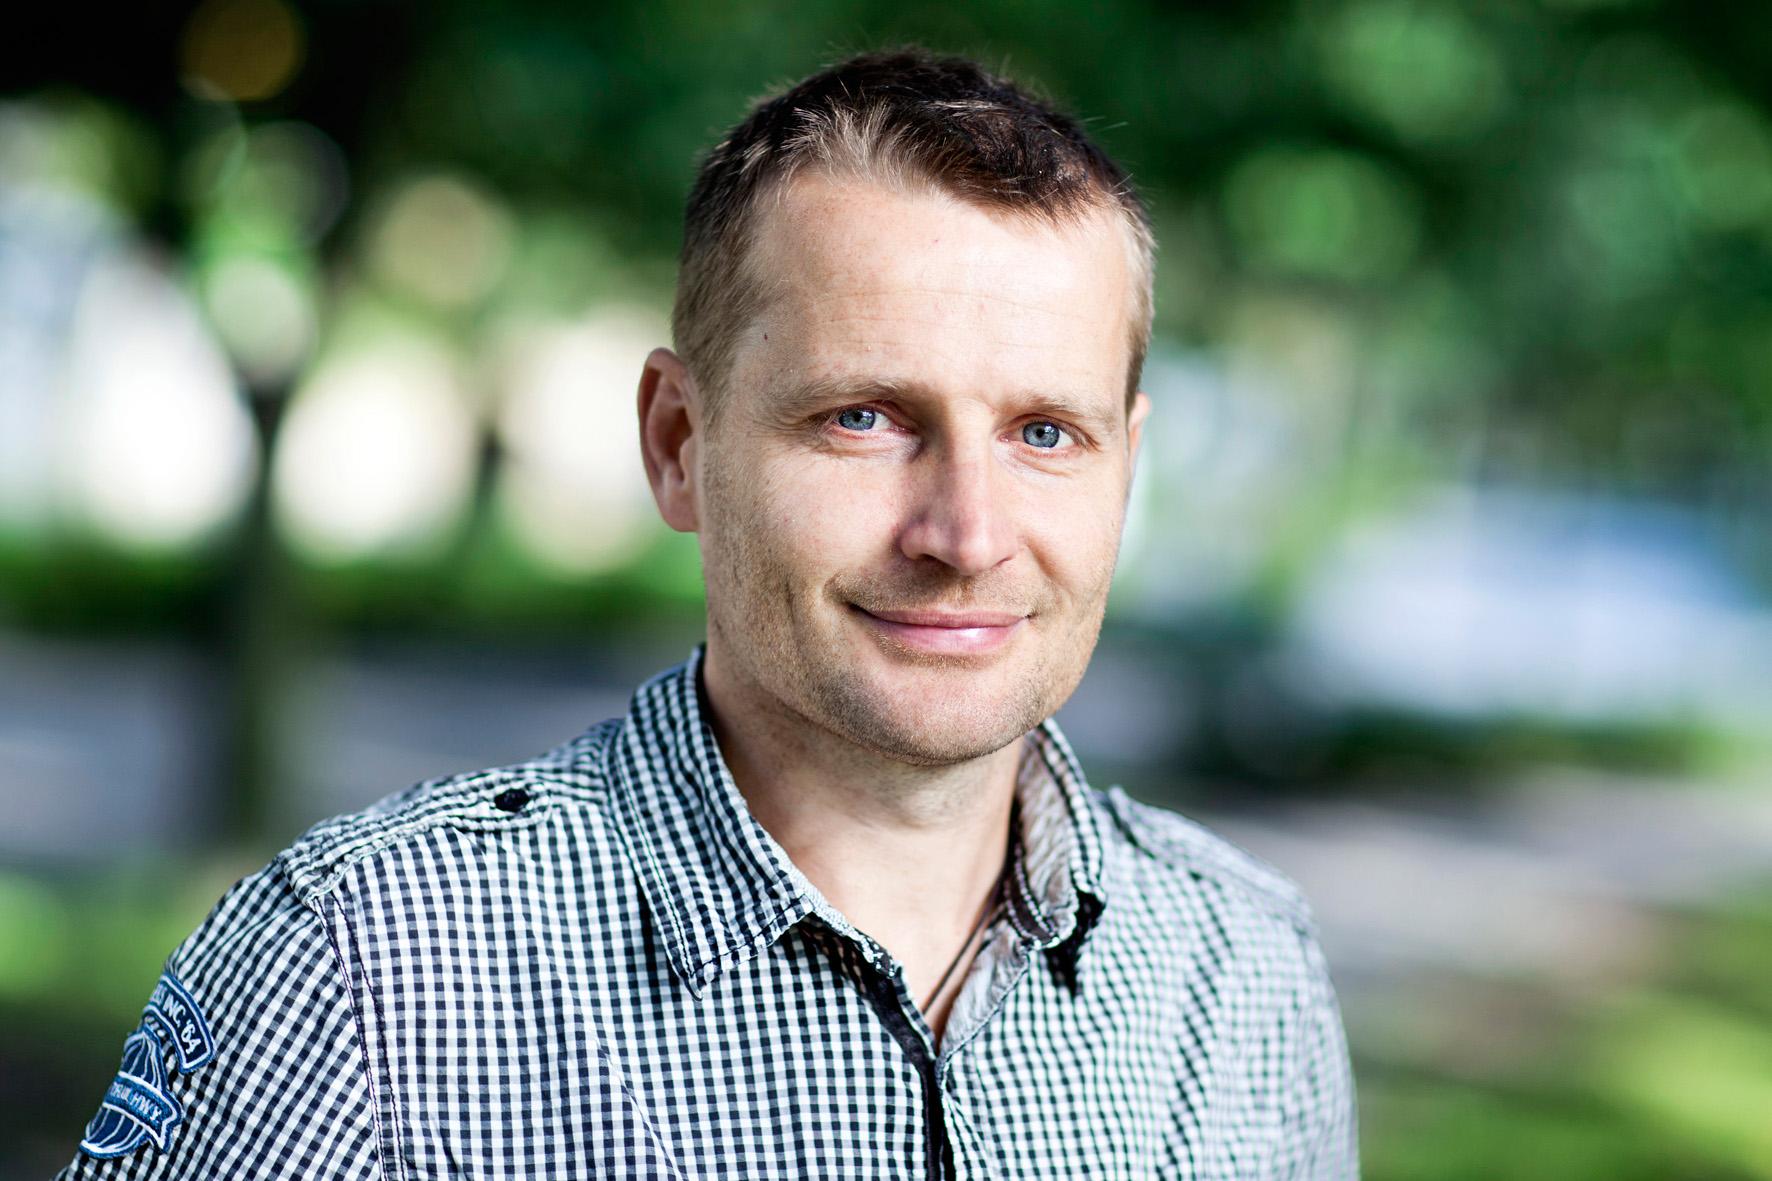 Johannes Overgaard